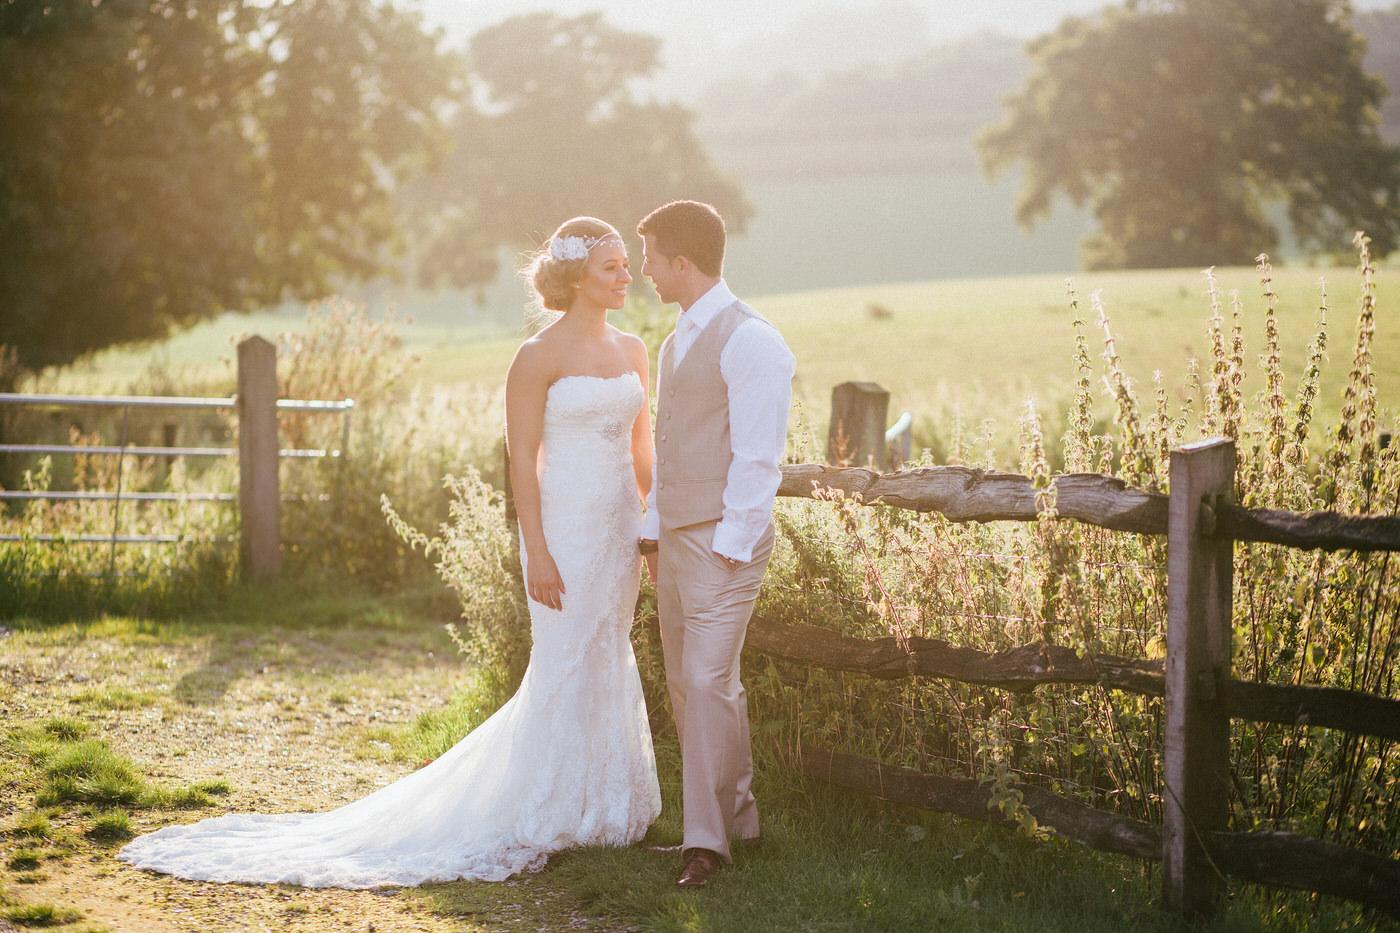 gaynes-park-wedding-photography-34.JPG